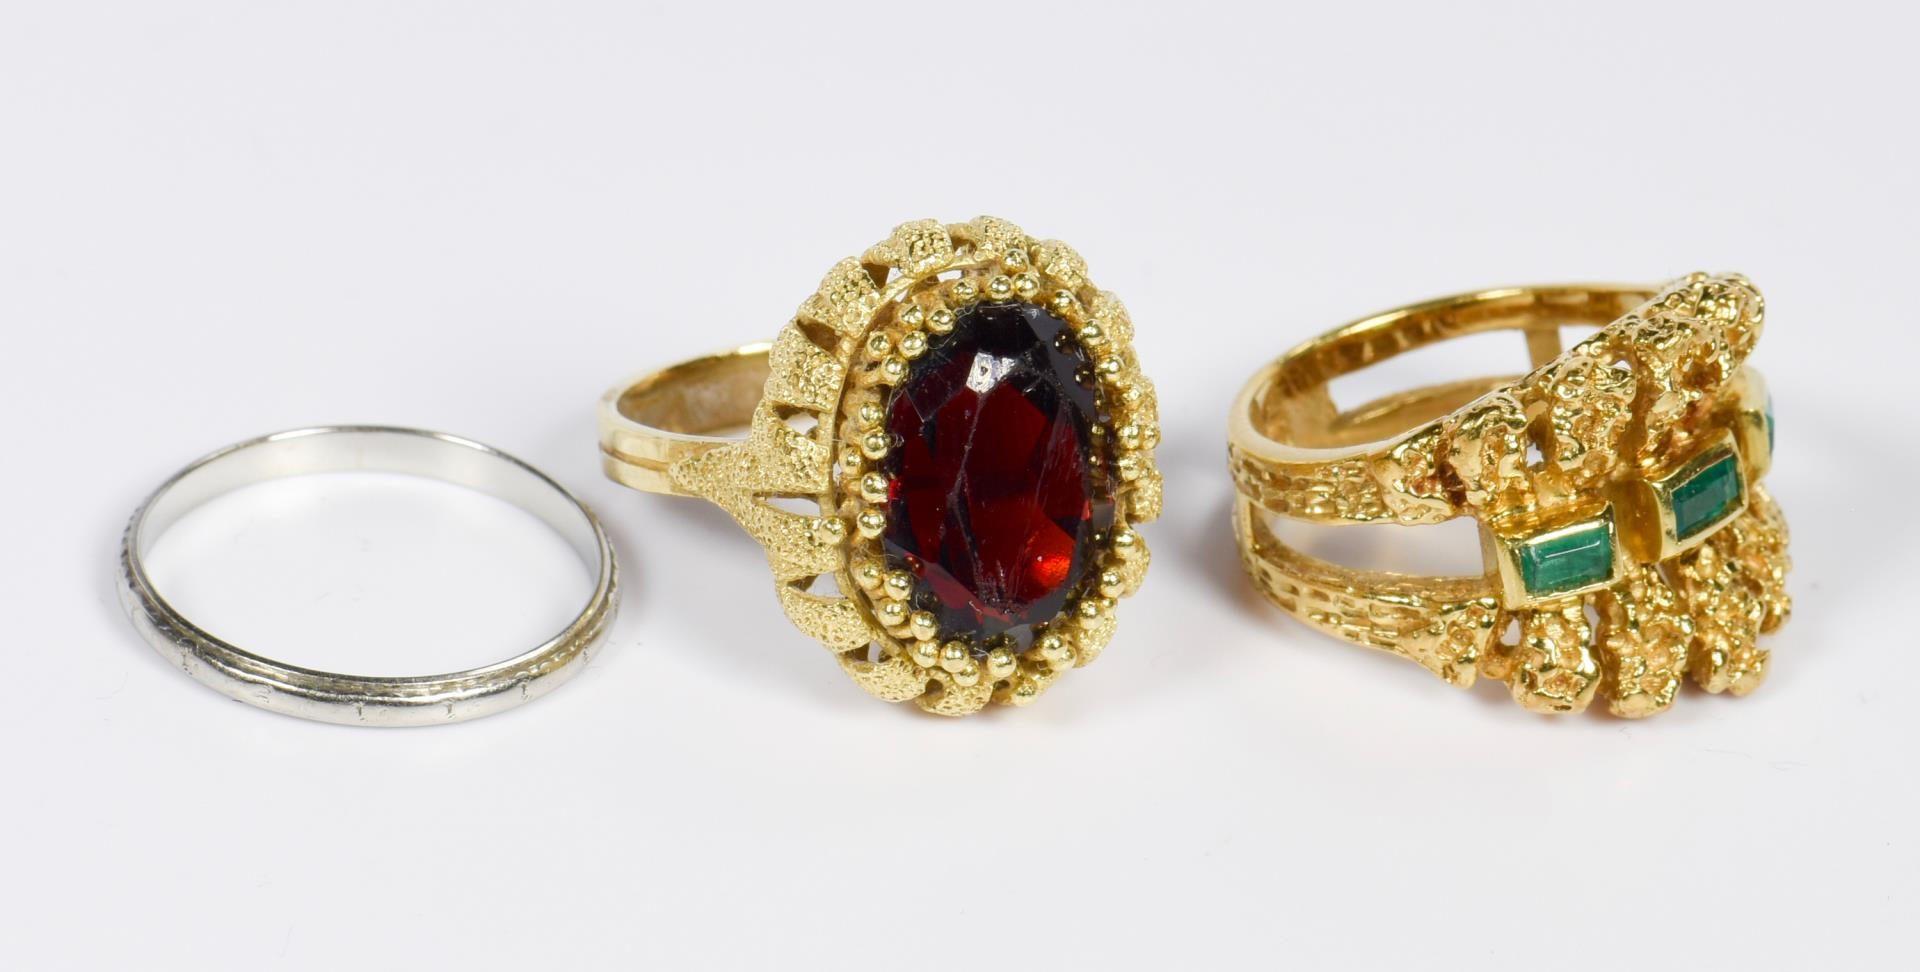 Lot 20: Three 18K Ladies Rings